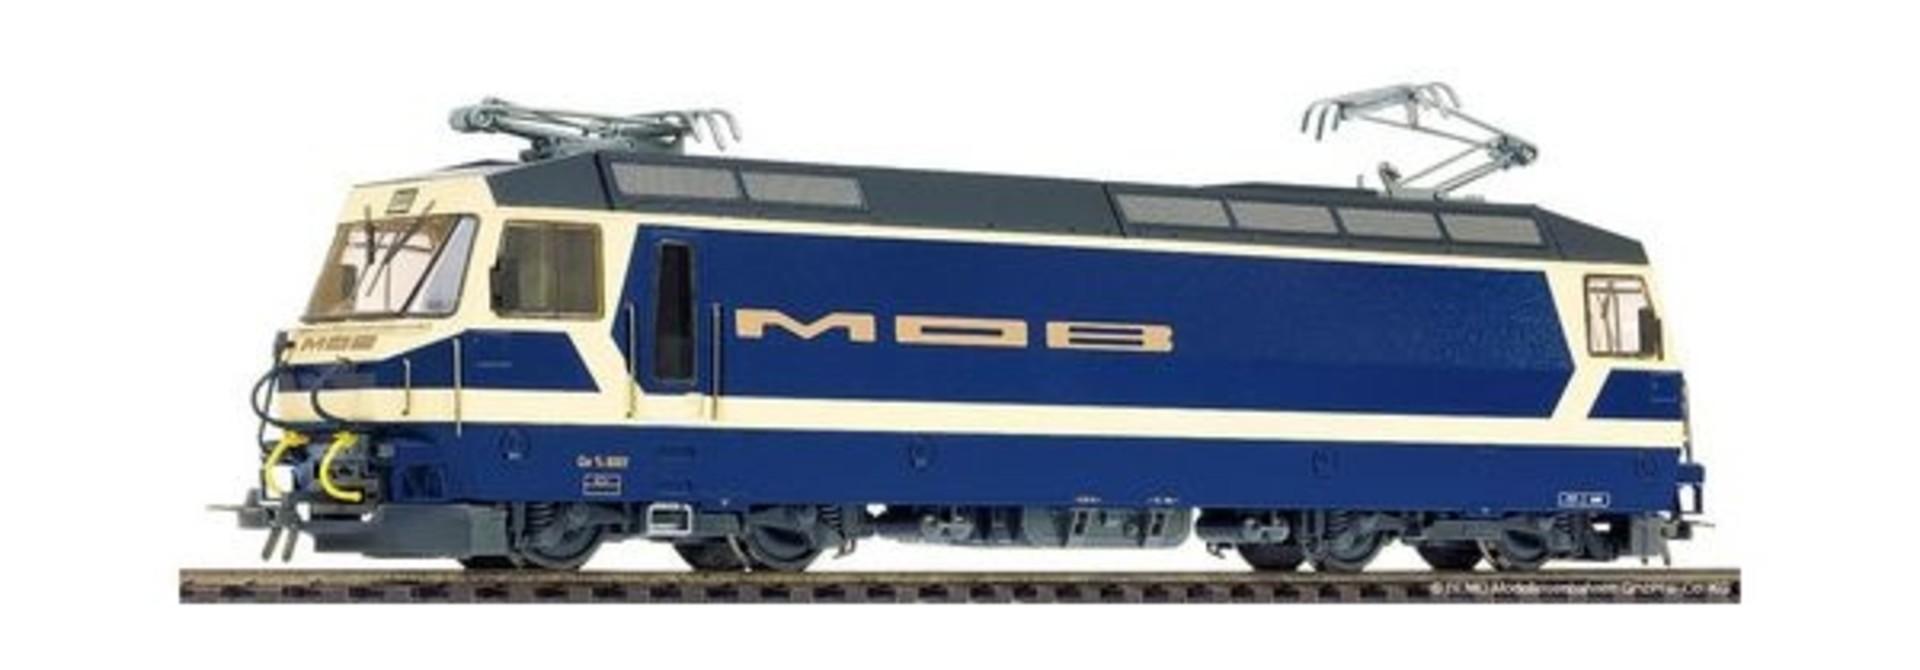 1259301 MOB Ge 4/4 8001 Universallok